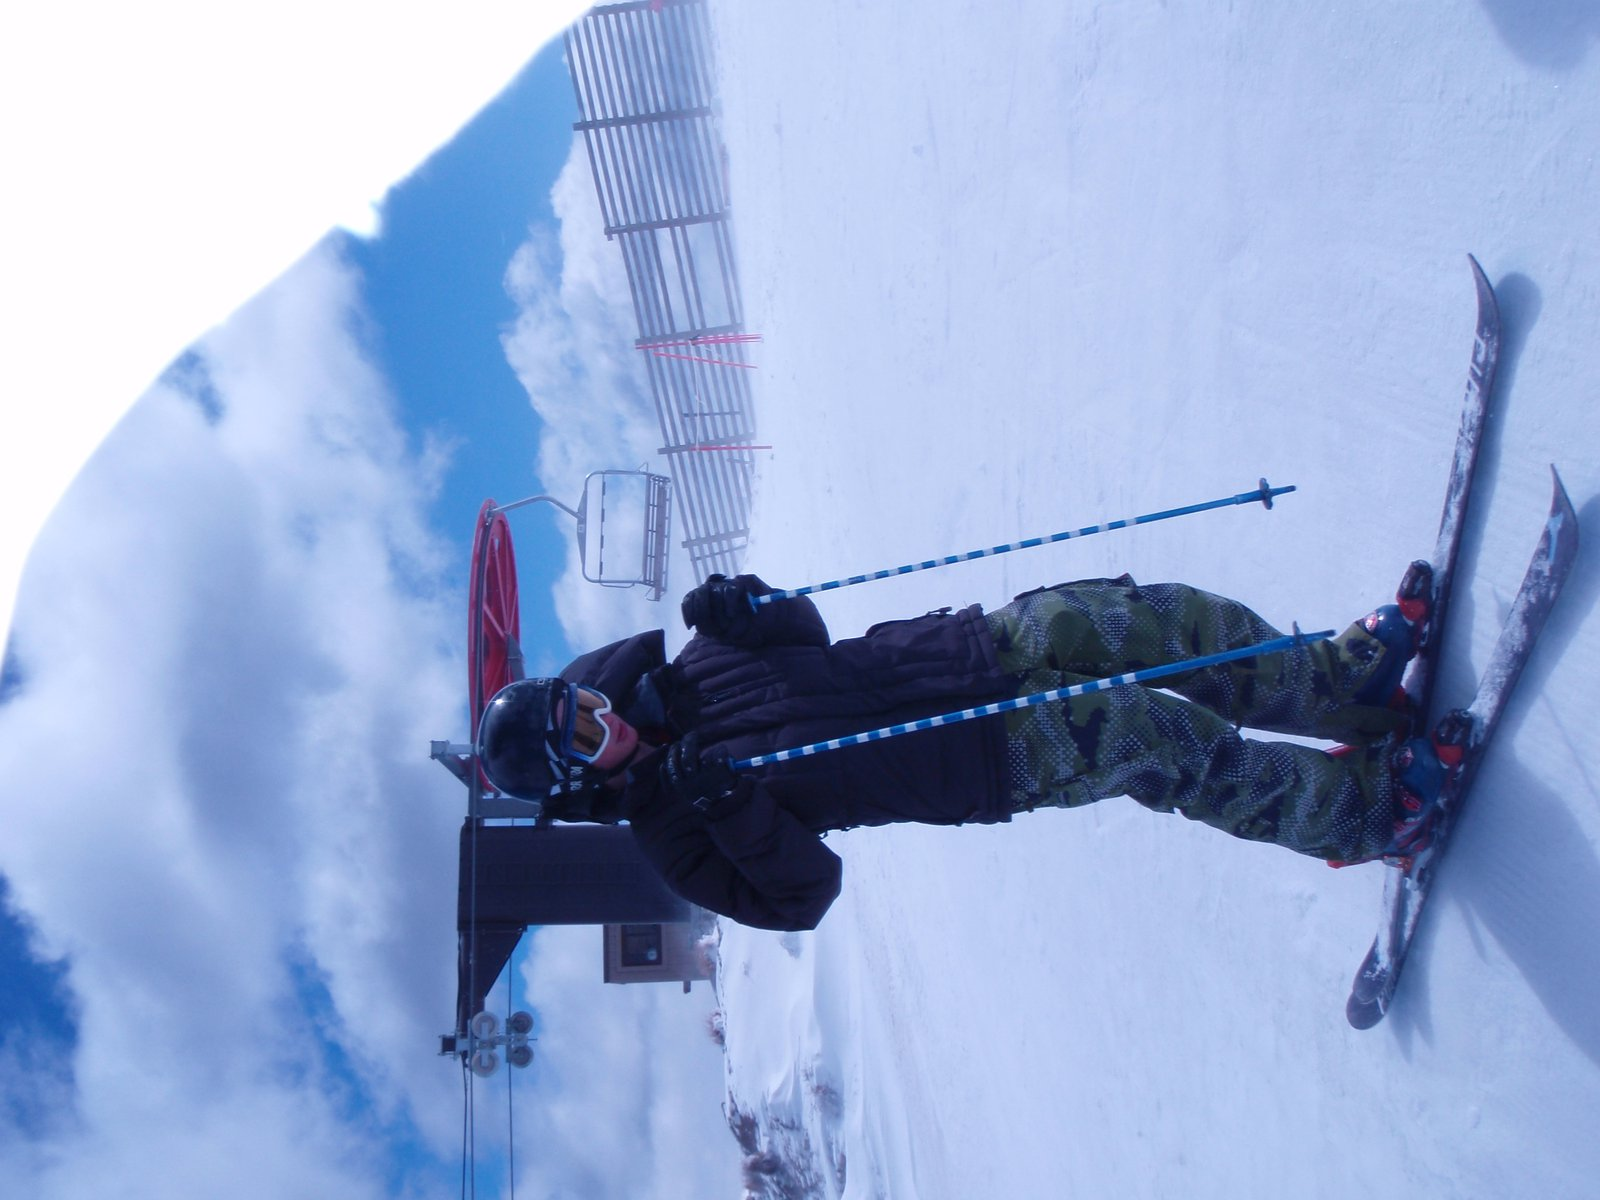 Me at snowpark